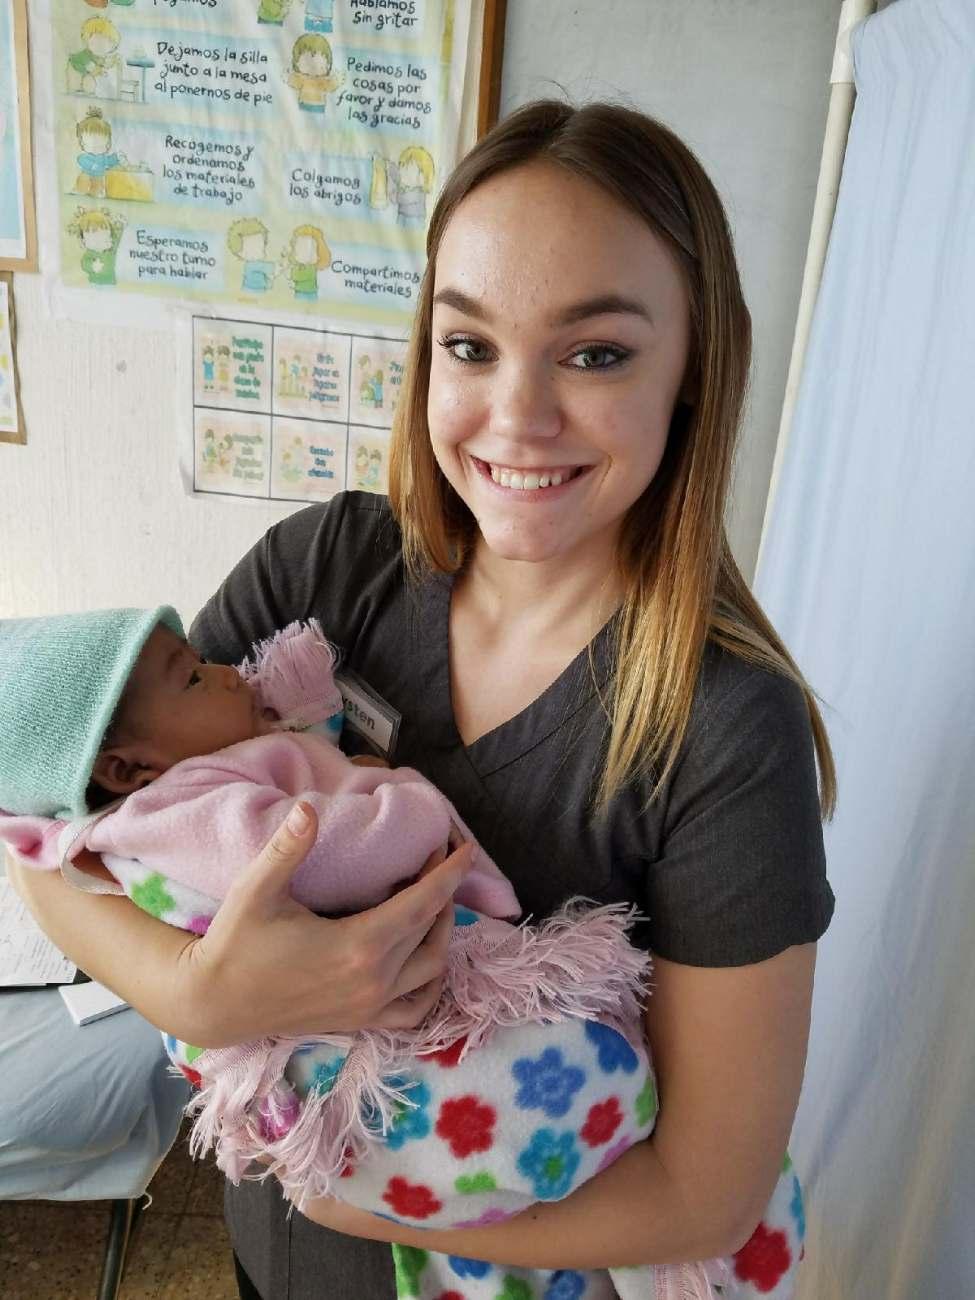 7. Janelle & baby .jpg